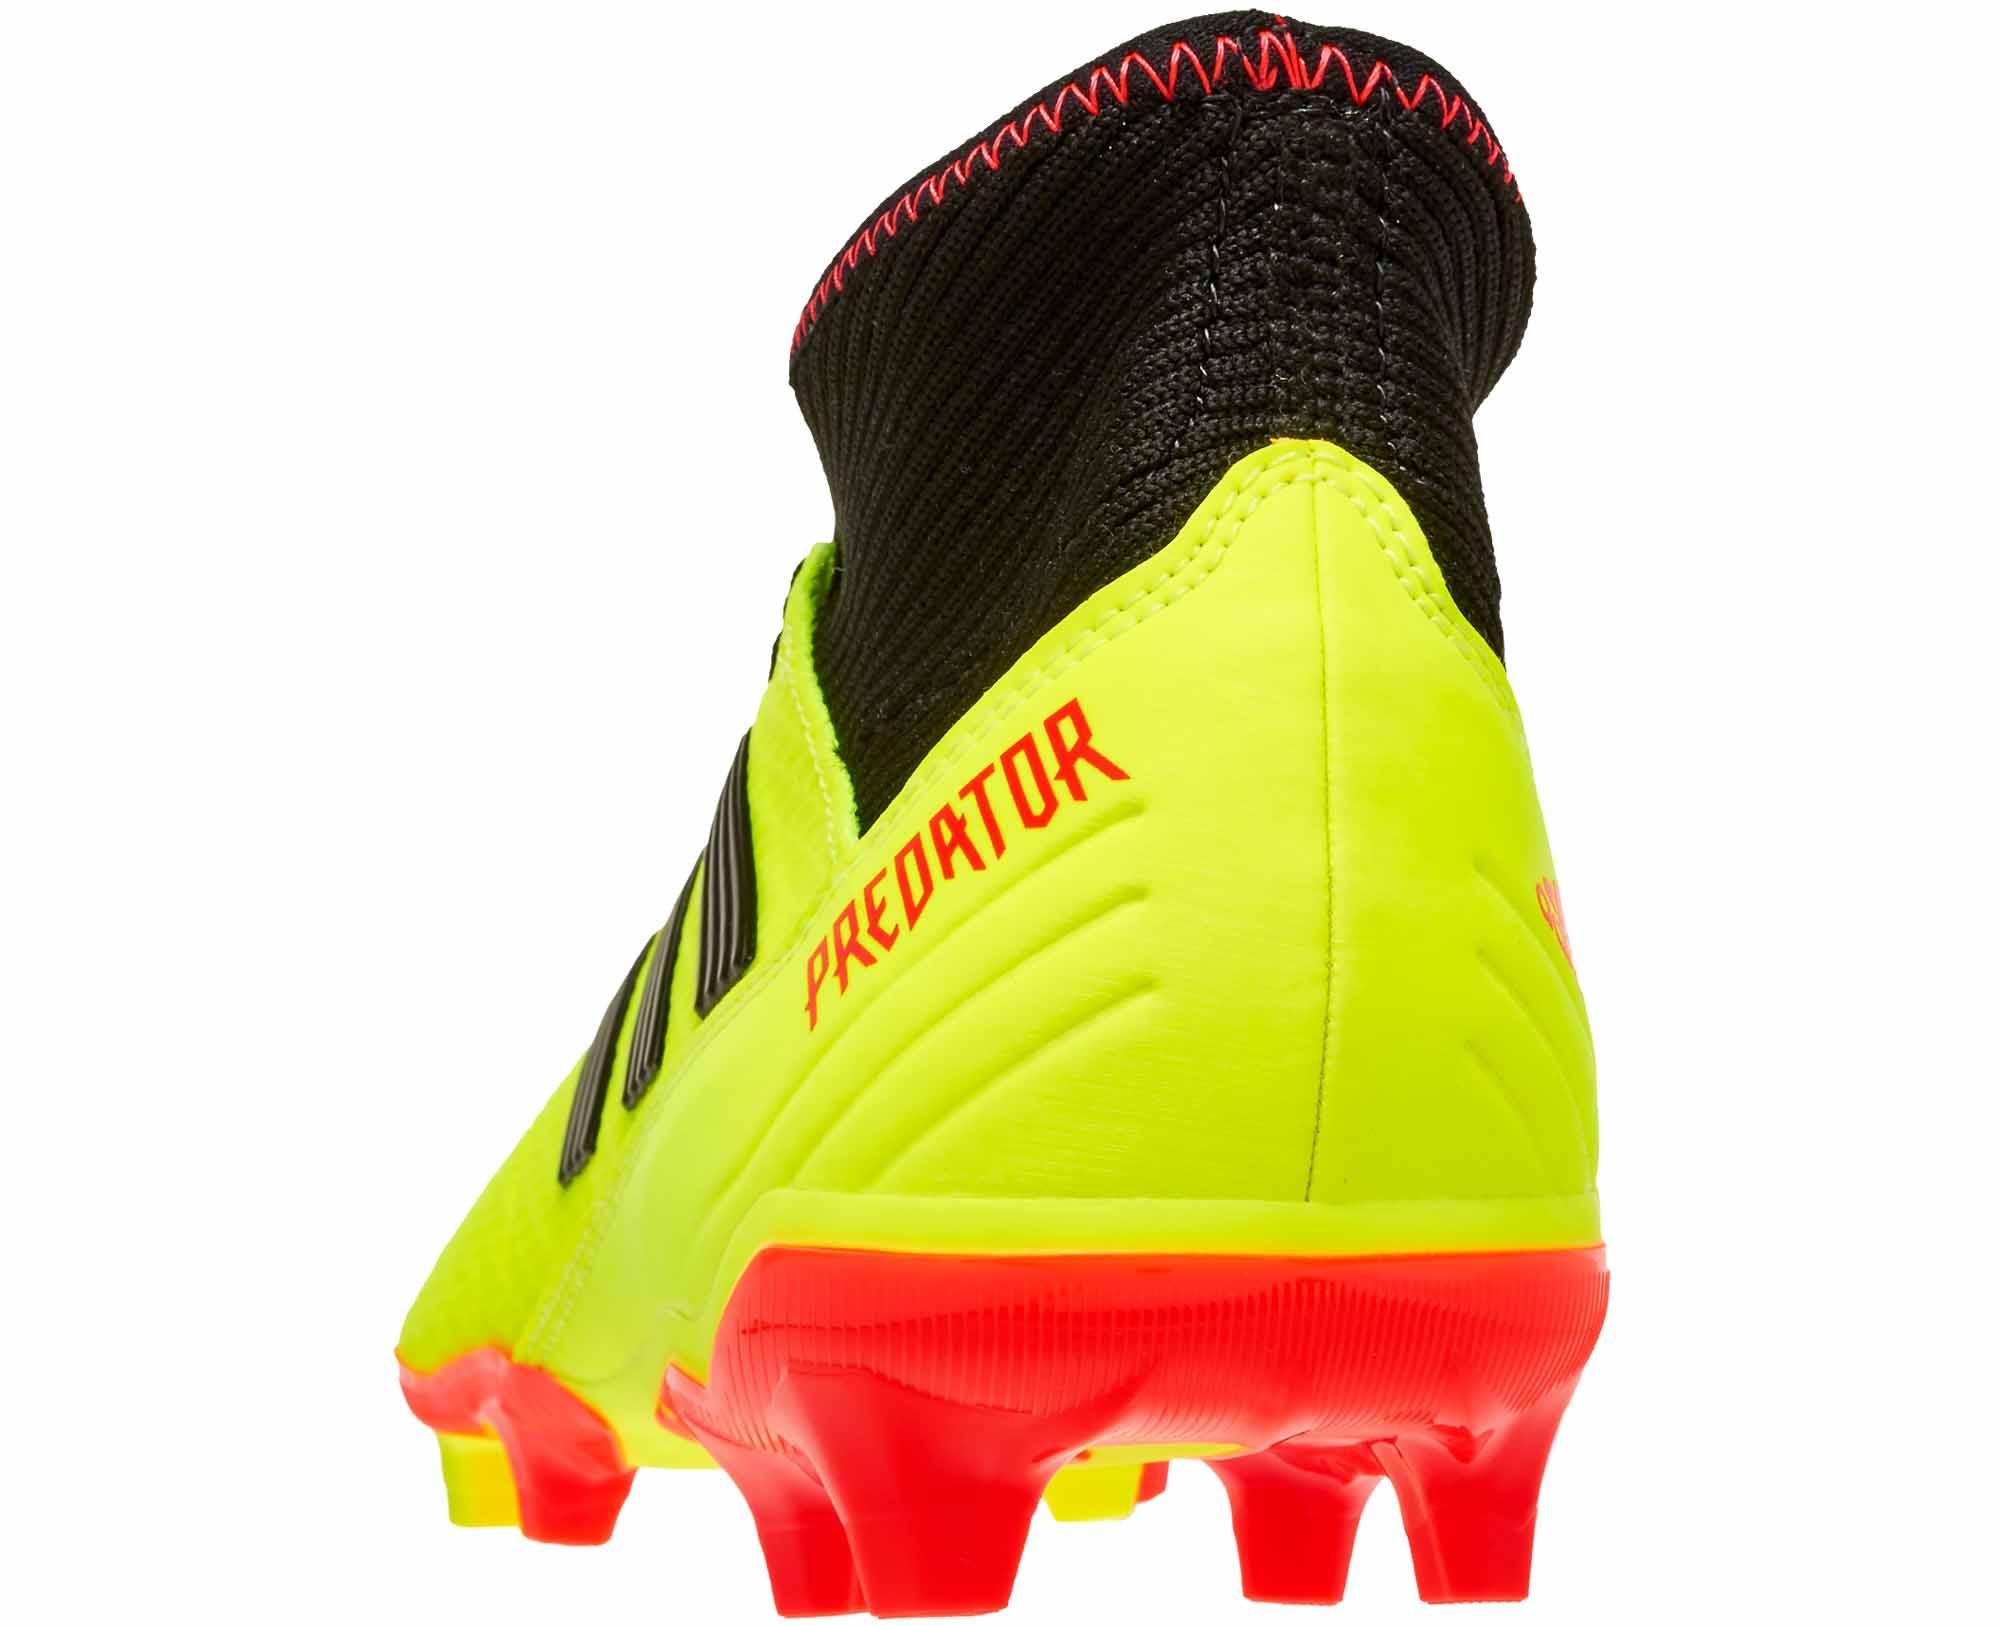 b5b64230a200 adidas Predator 18.3 FG - Energy Mode - SoccerPro